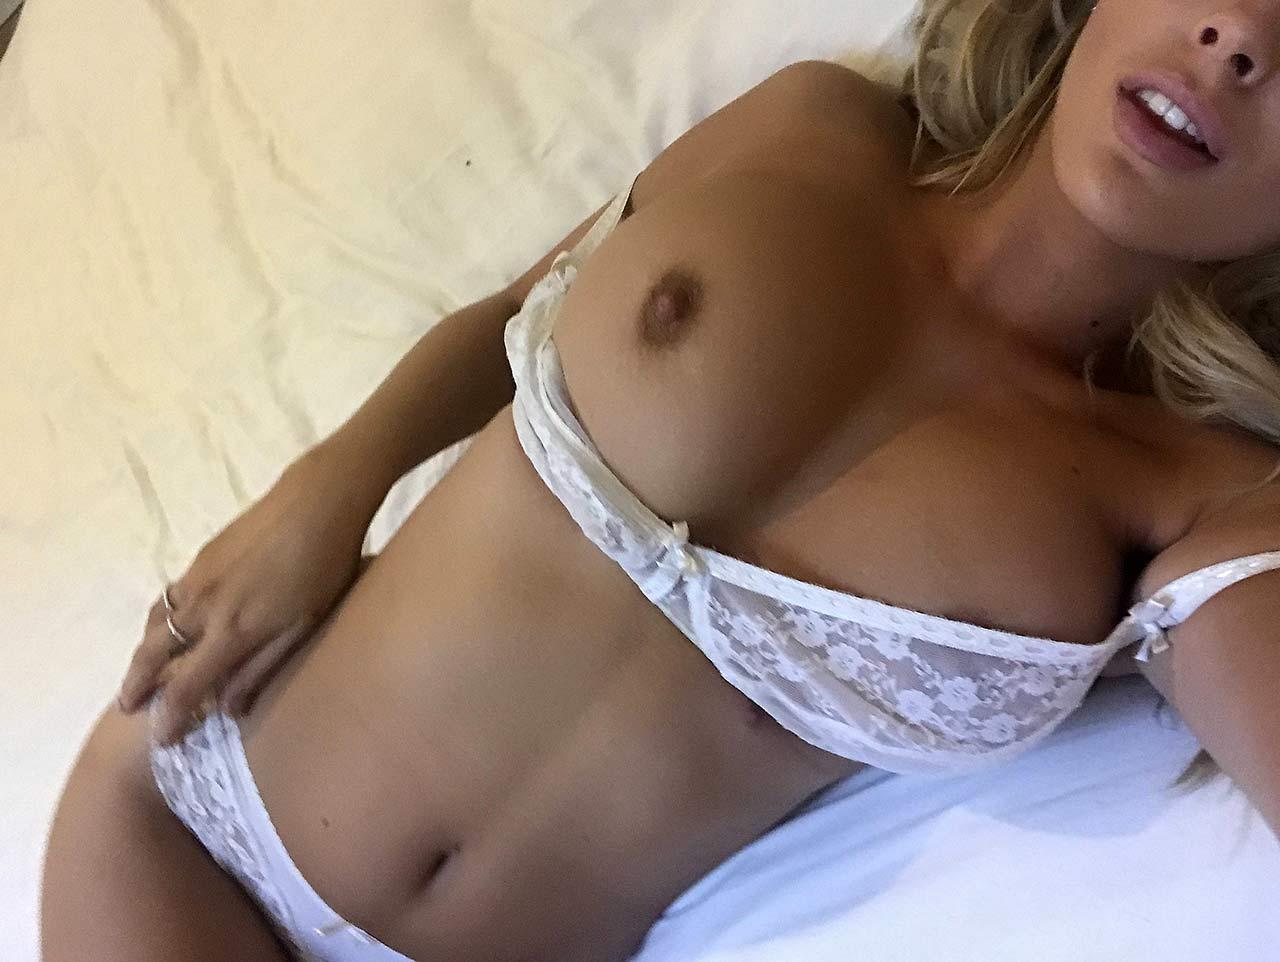 Fuck Emma Hernan nudes (79 photos), Pussy, Fappening, Selfie, swimsuit 2015